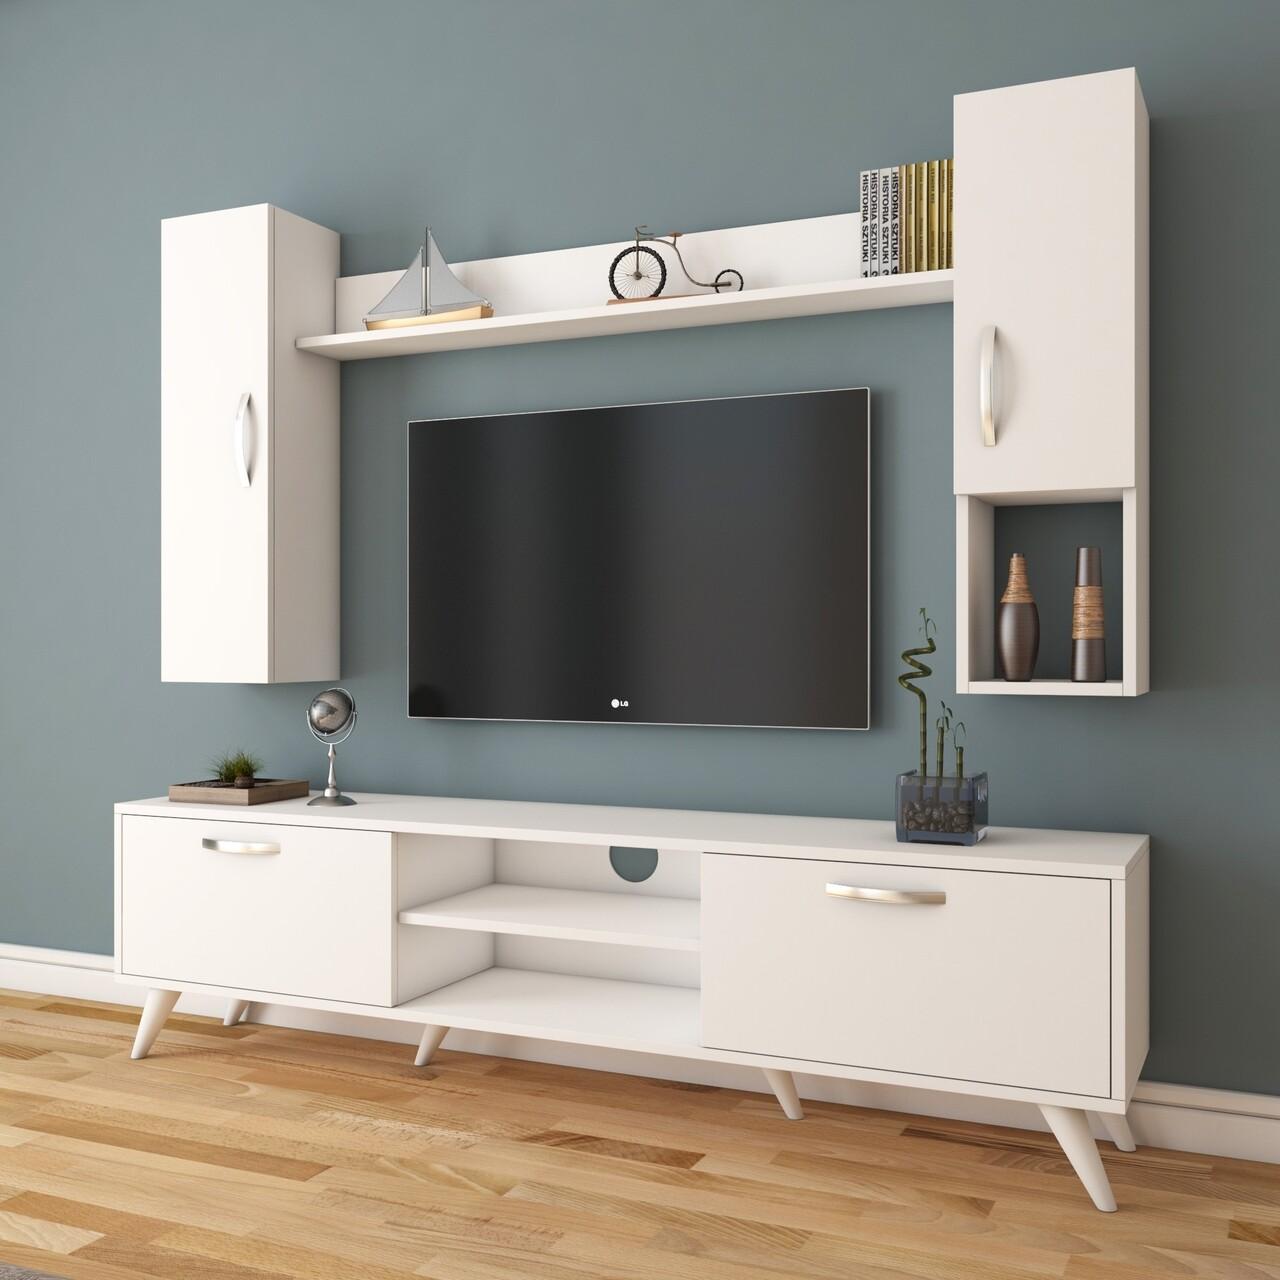 Comoda TV cu raft de perete si 2 cabinete M22 - 273, Wren, 180 x 35 x 48.6 cm/90 cm/133 cm, white